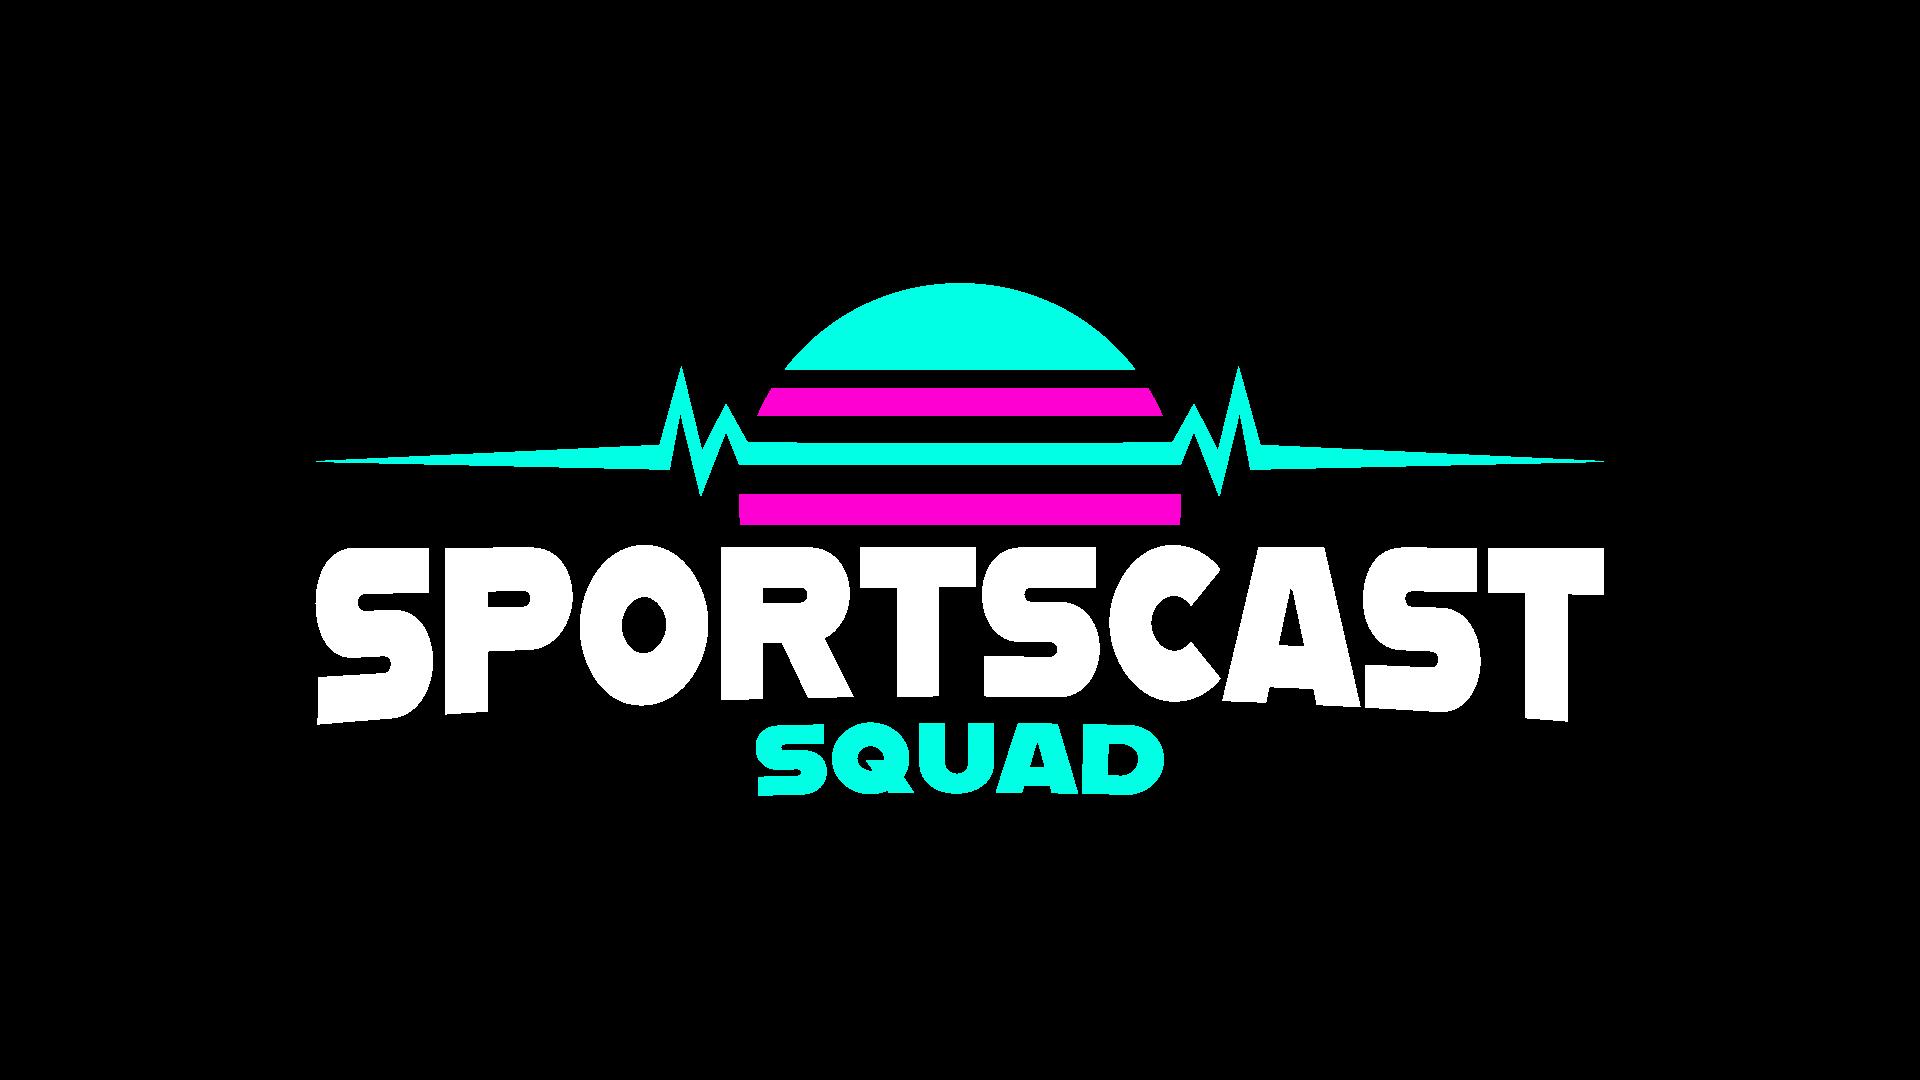 Sports Cast Squad